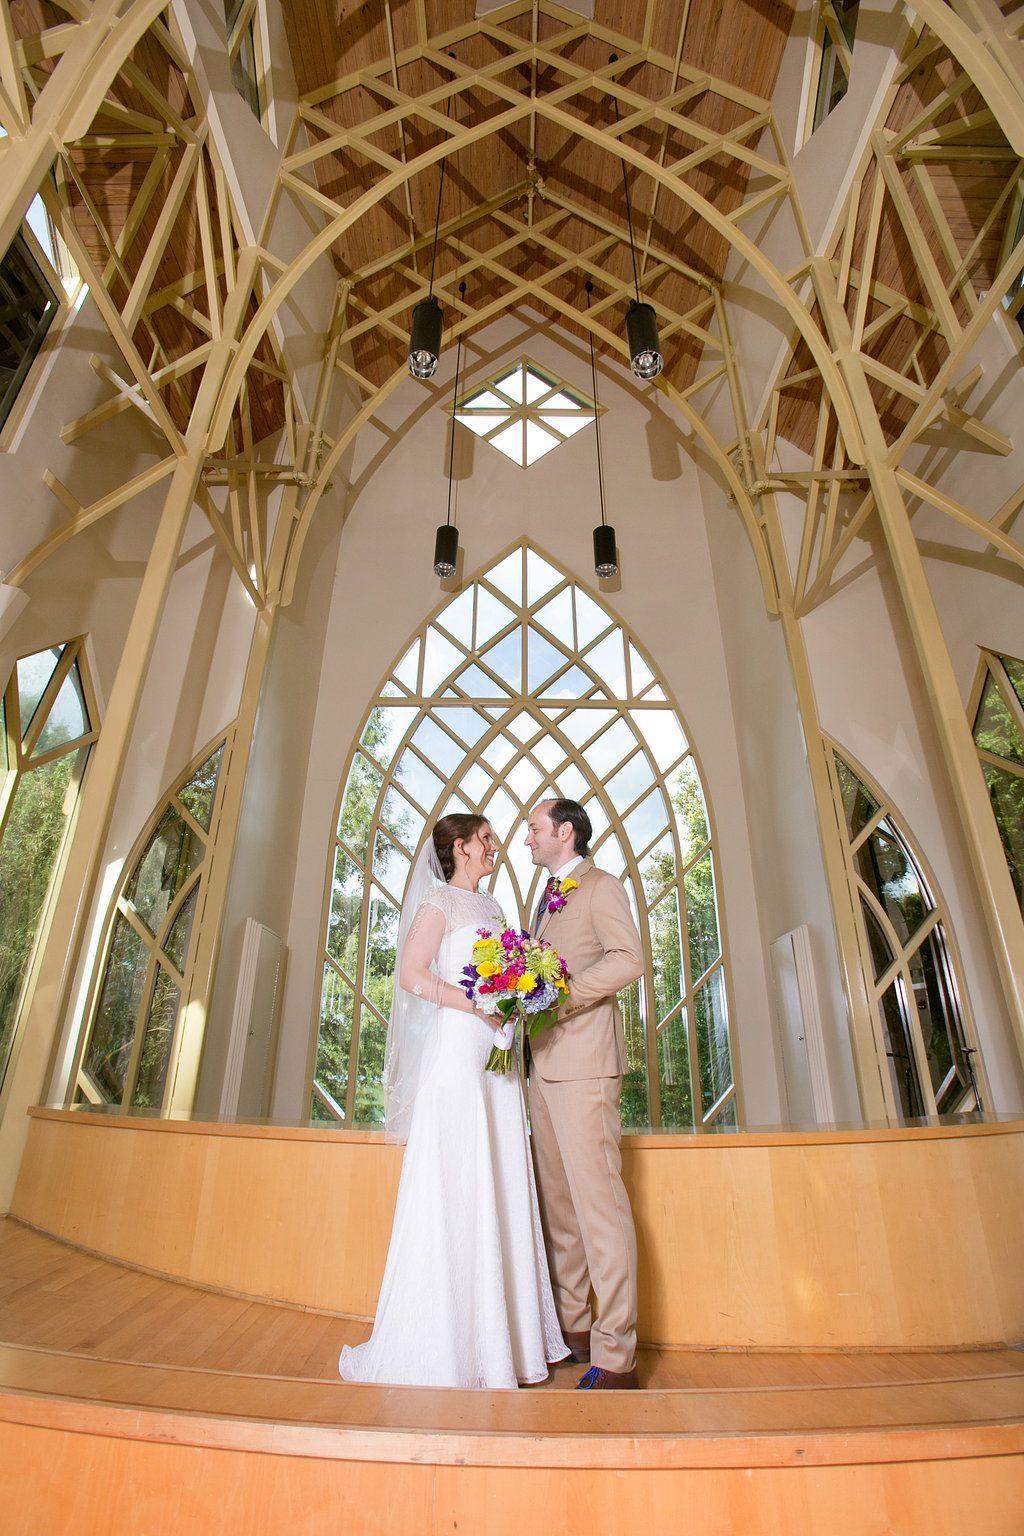 Wedding At The Baughman Center Gainesville Fl Photo By Verve